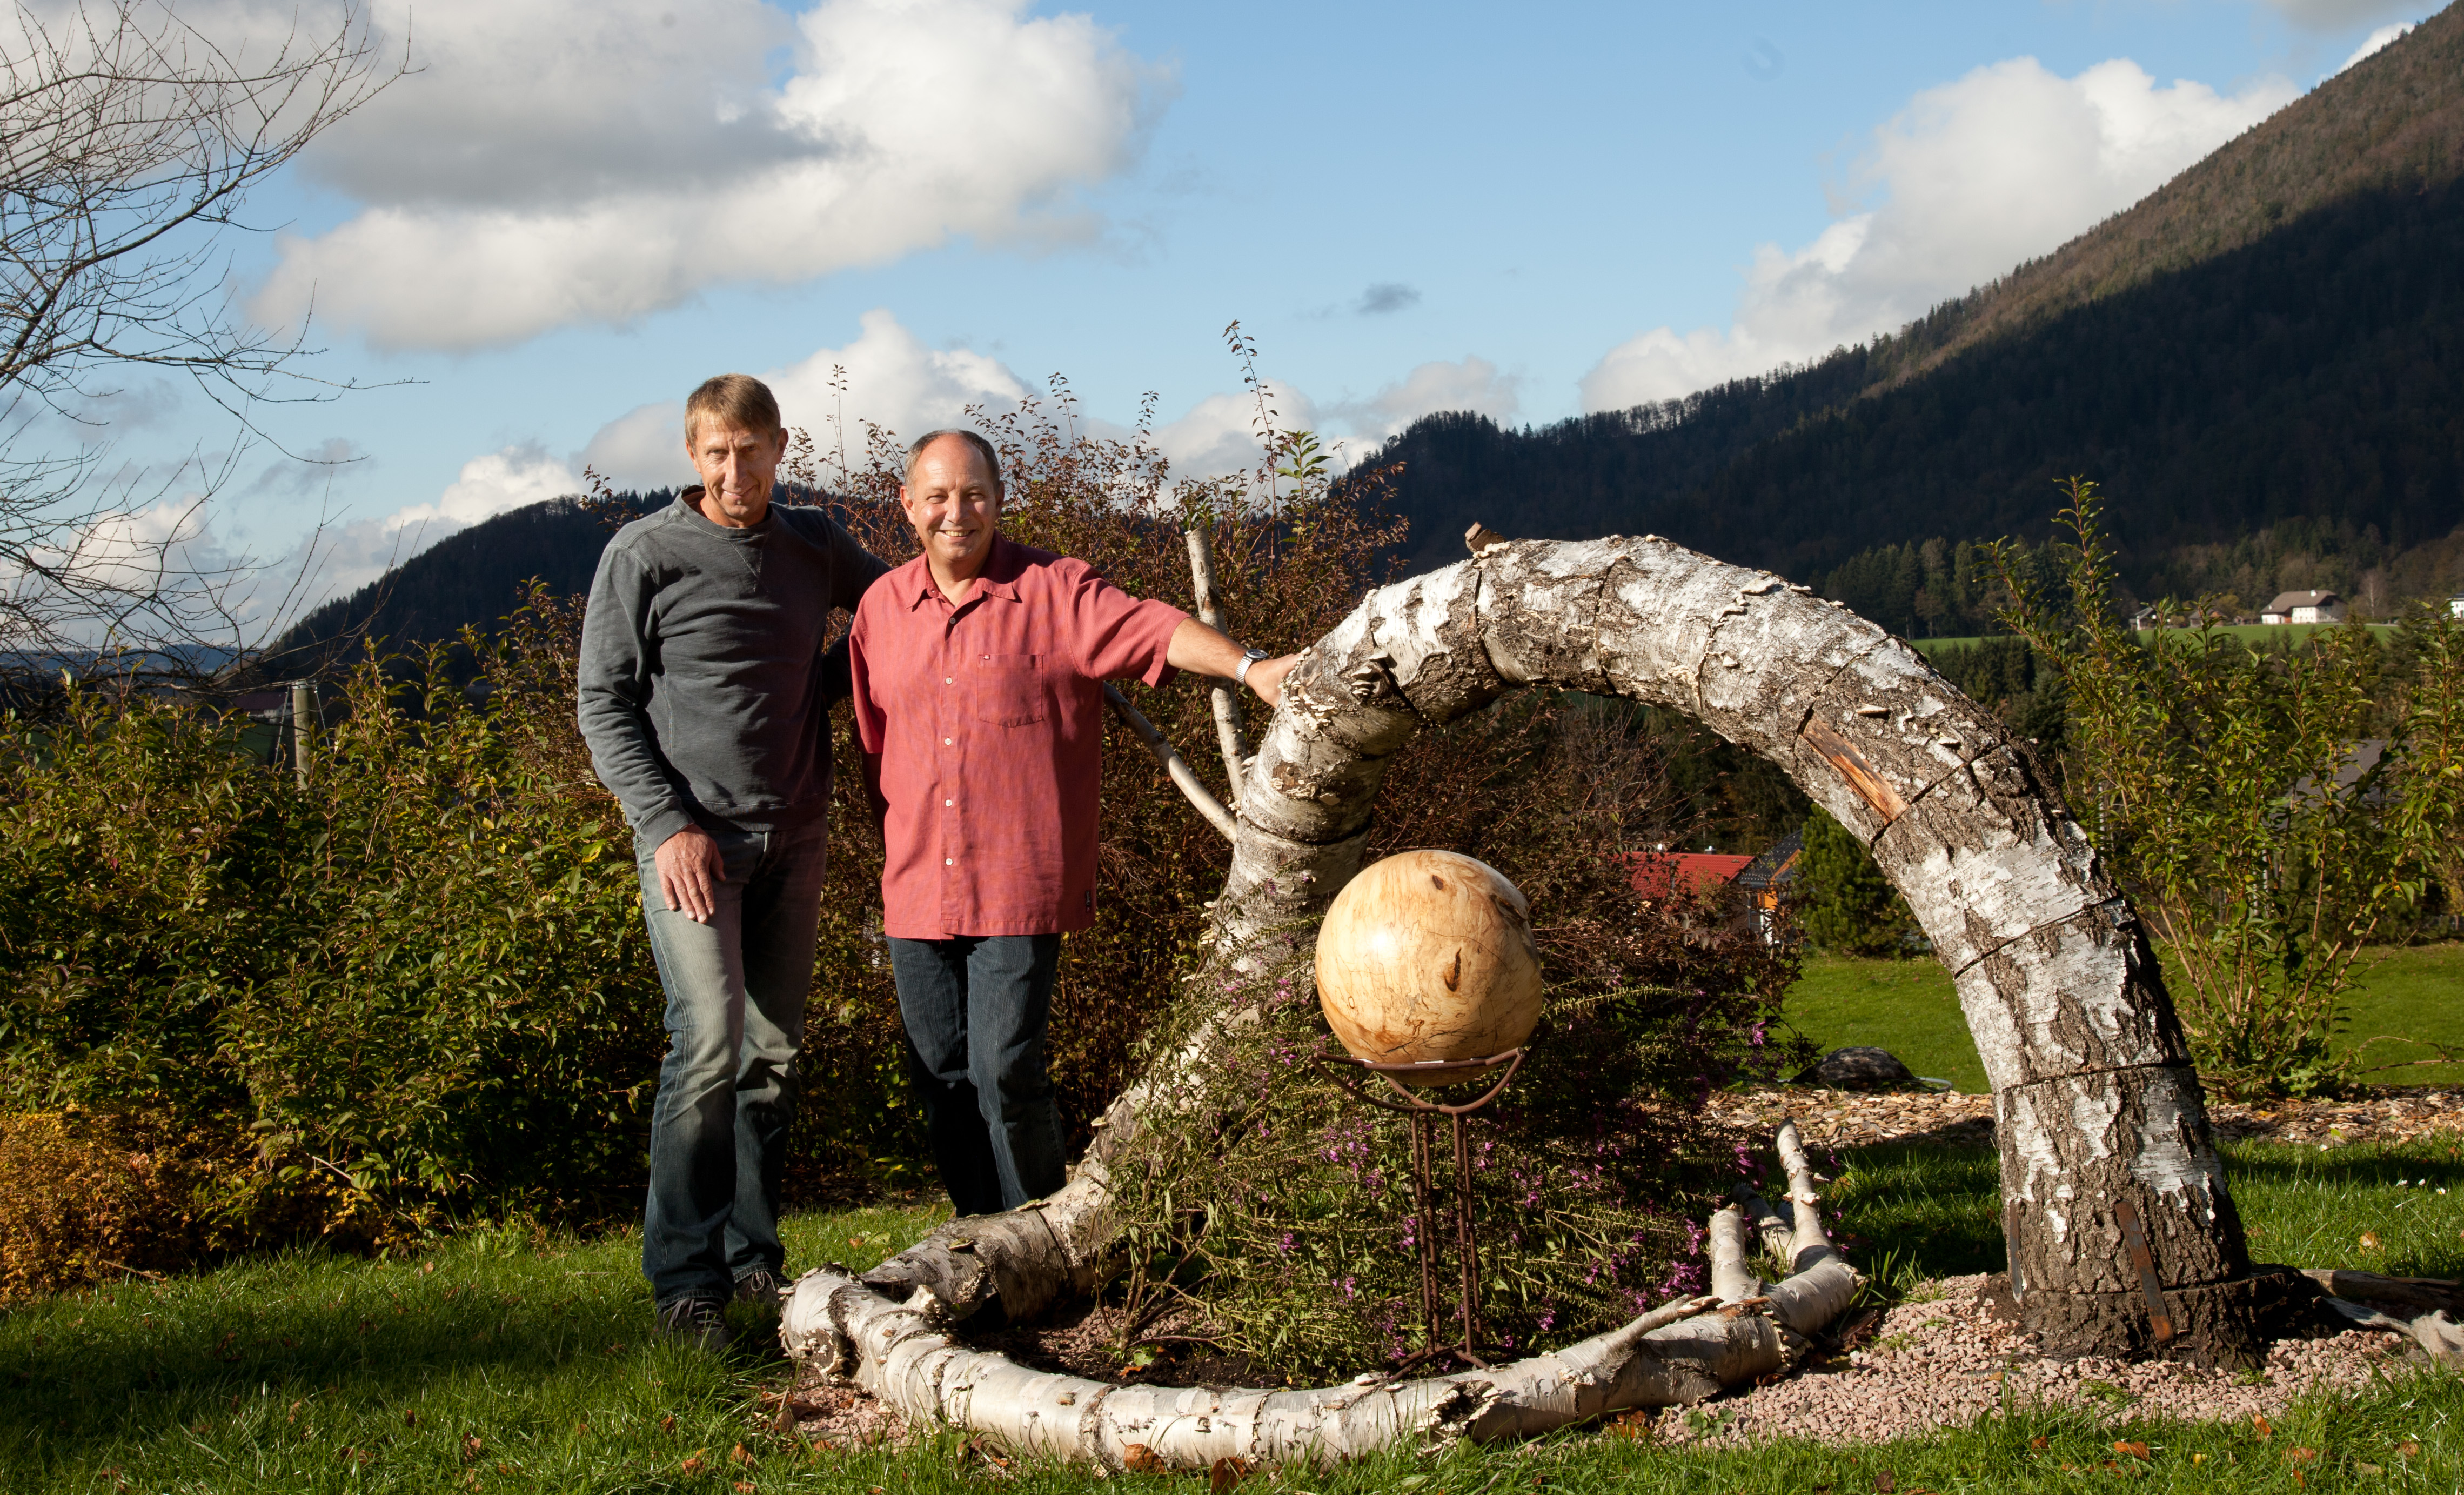 Michael Toferer & Christian Wahl